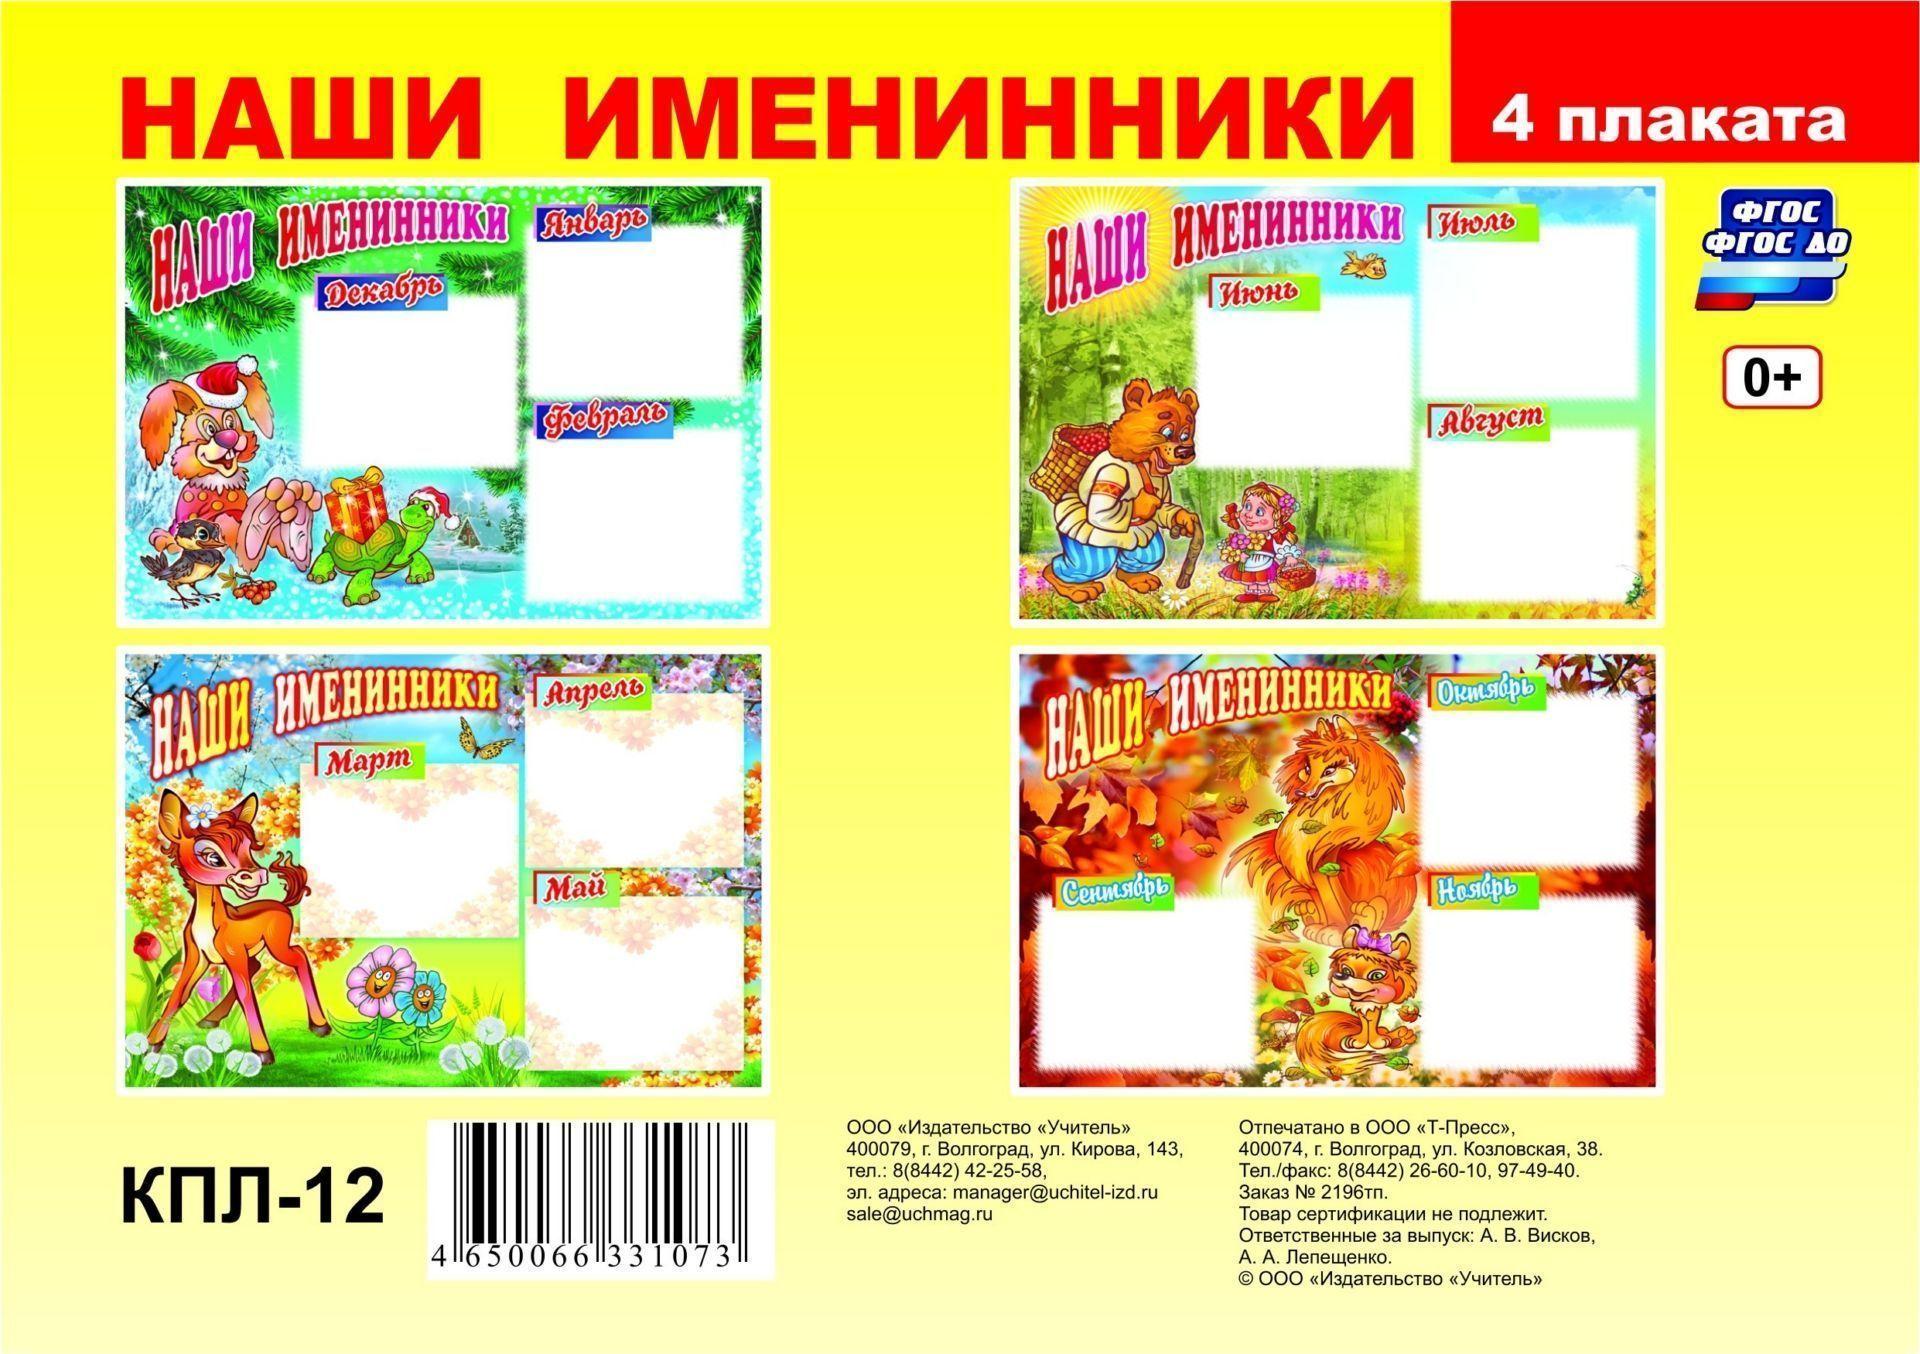 "Комплект плакатов ""Наши именинники"" (4 плаката: зима, весна, лето, осень)"